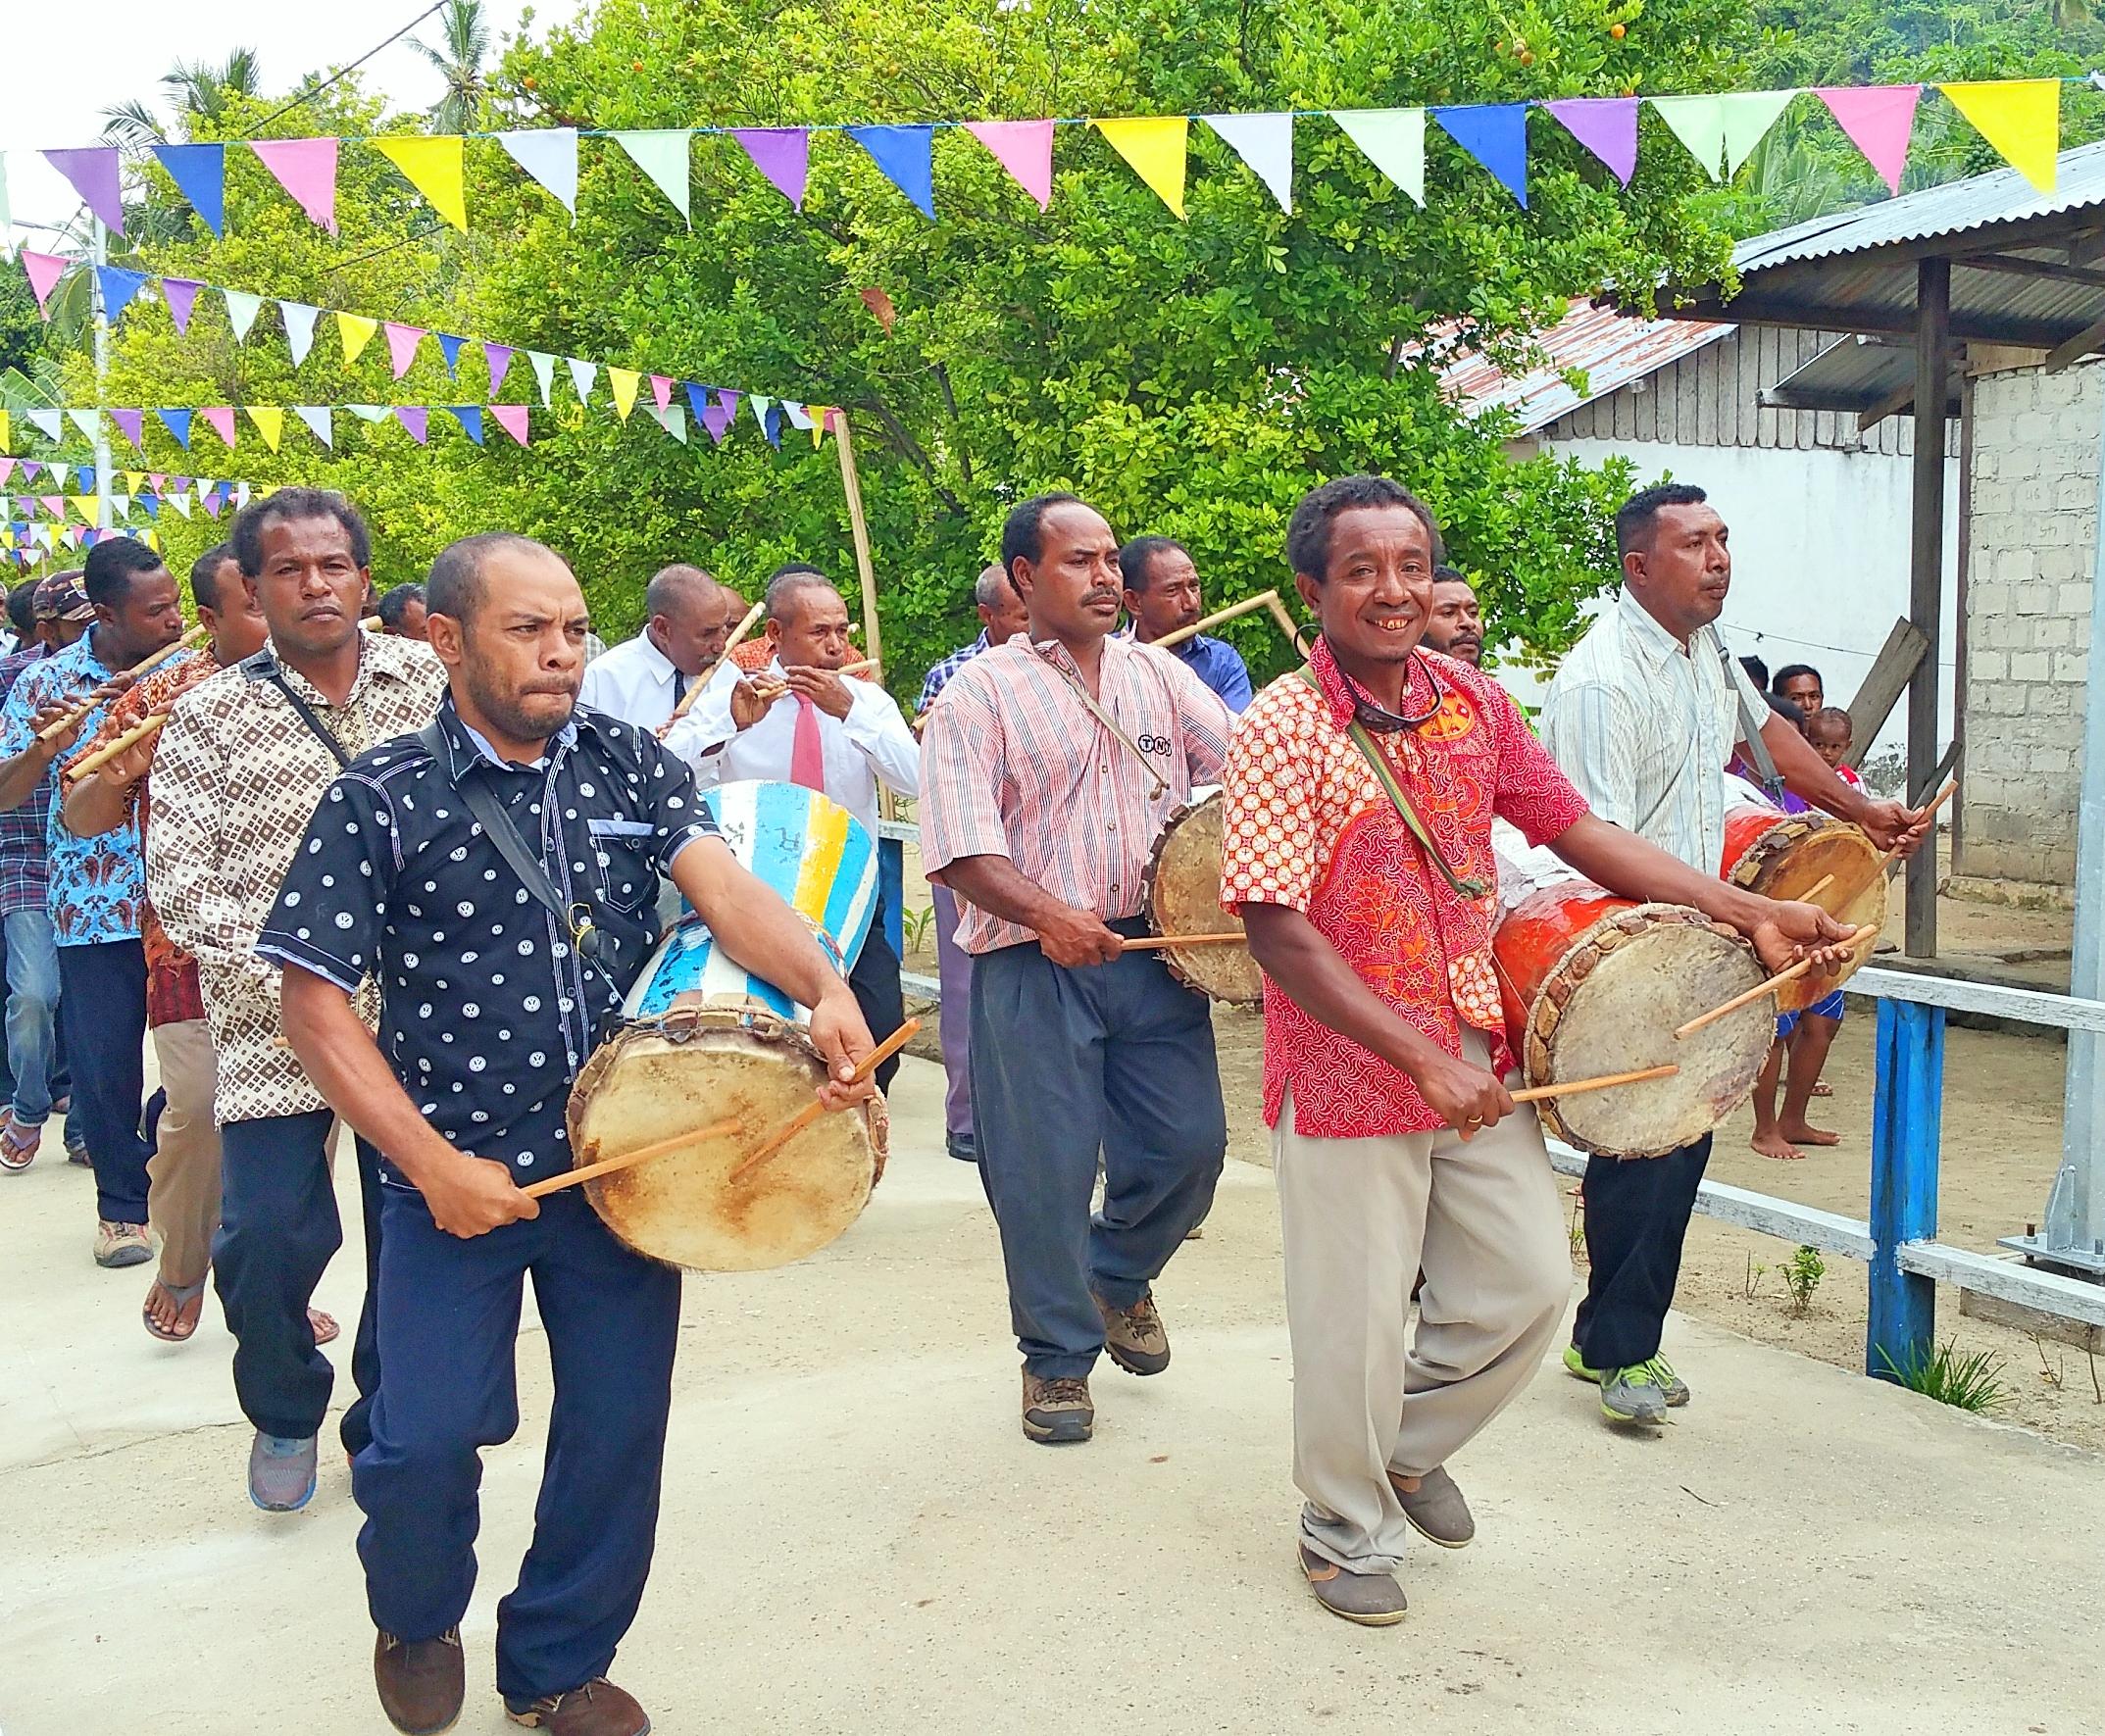 MahaRaja Eco Dive Lodge - Our Papuan friends love music